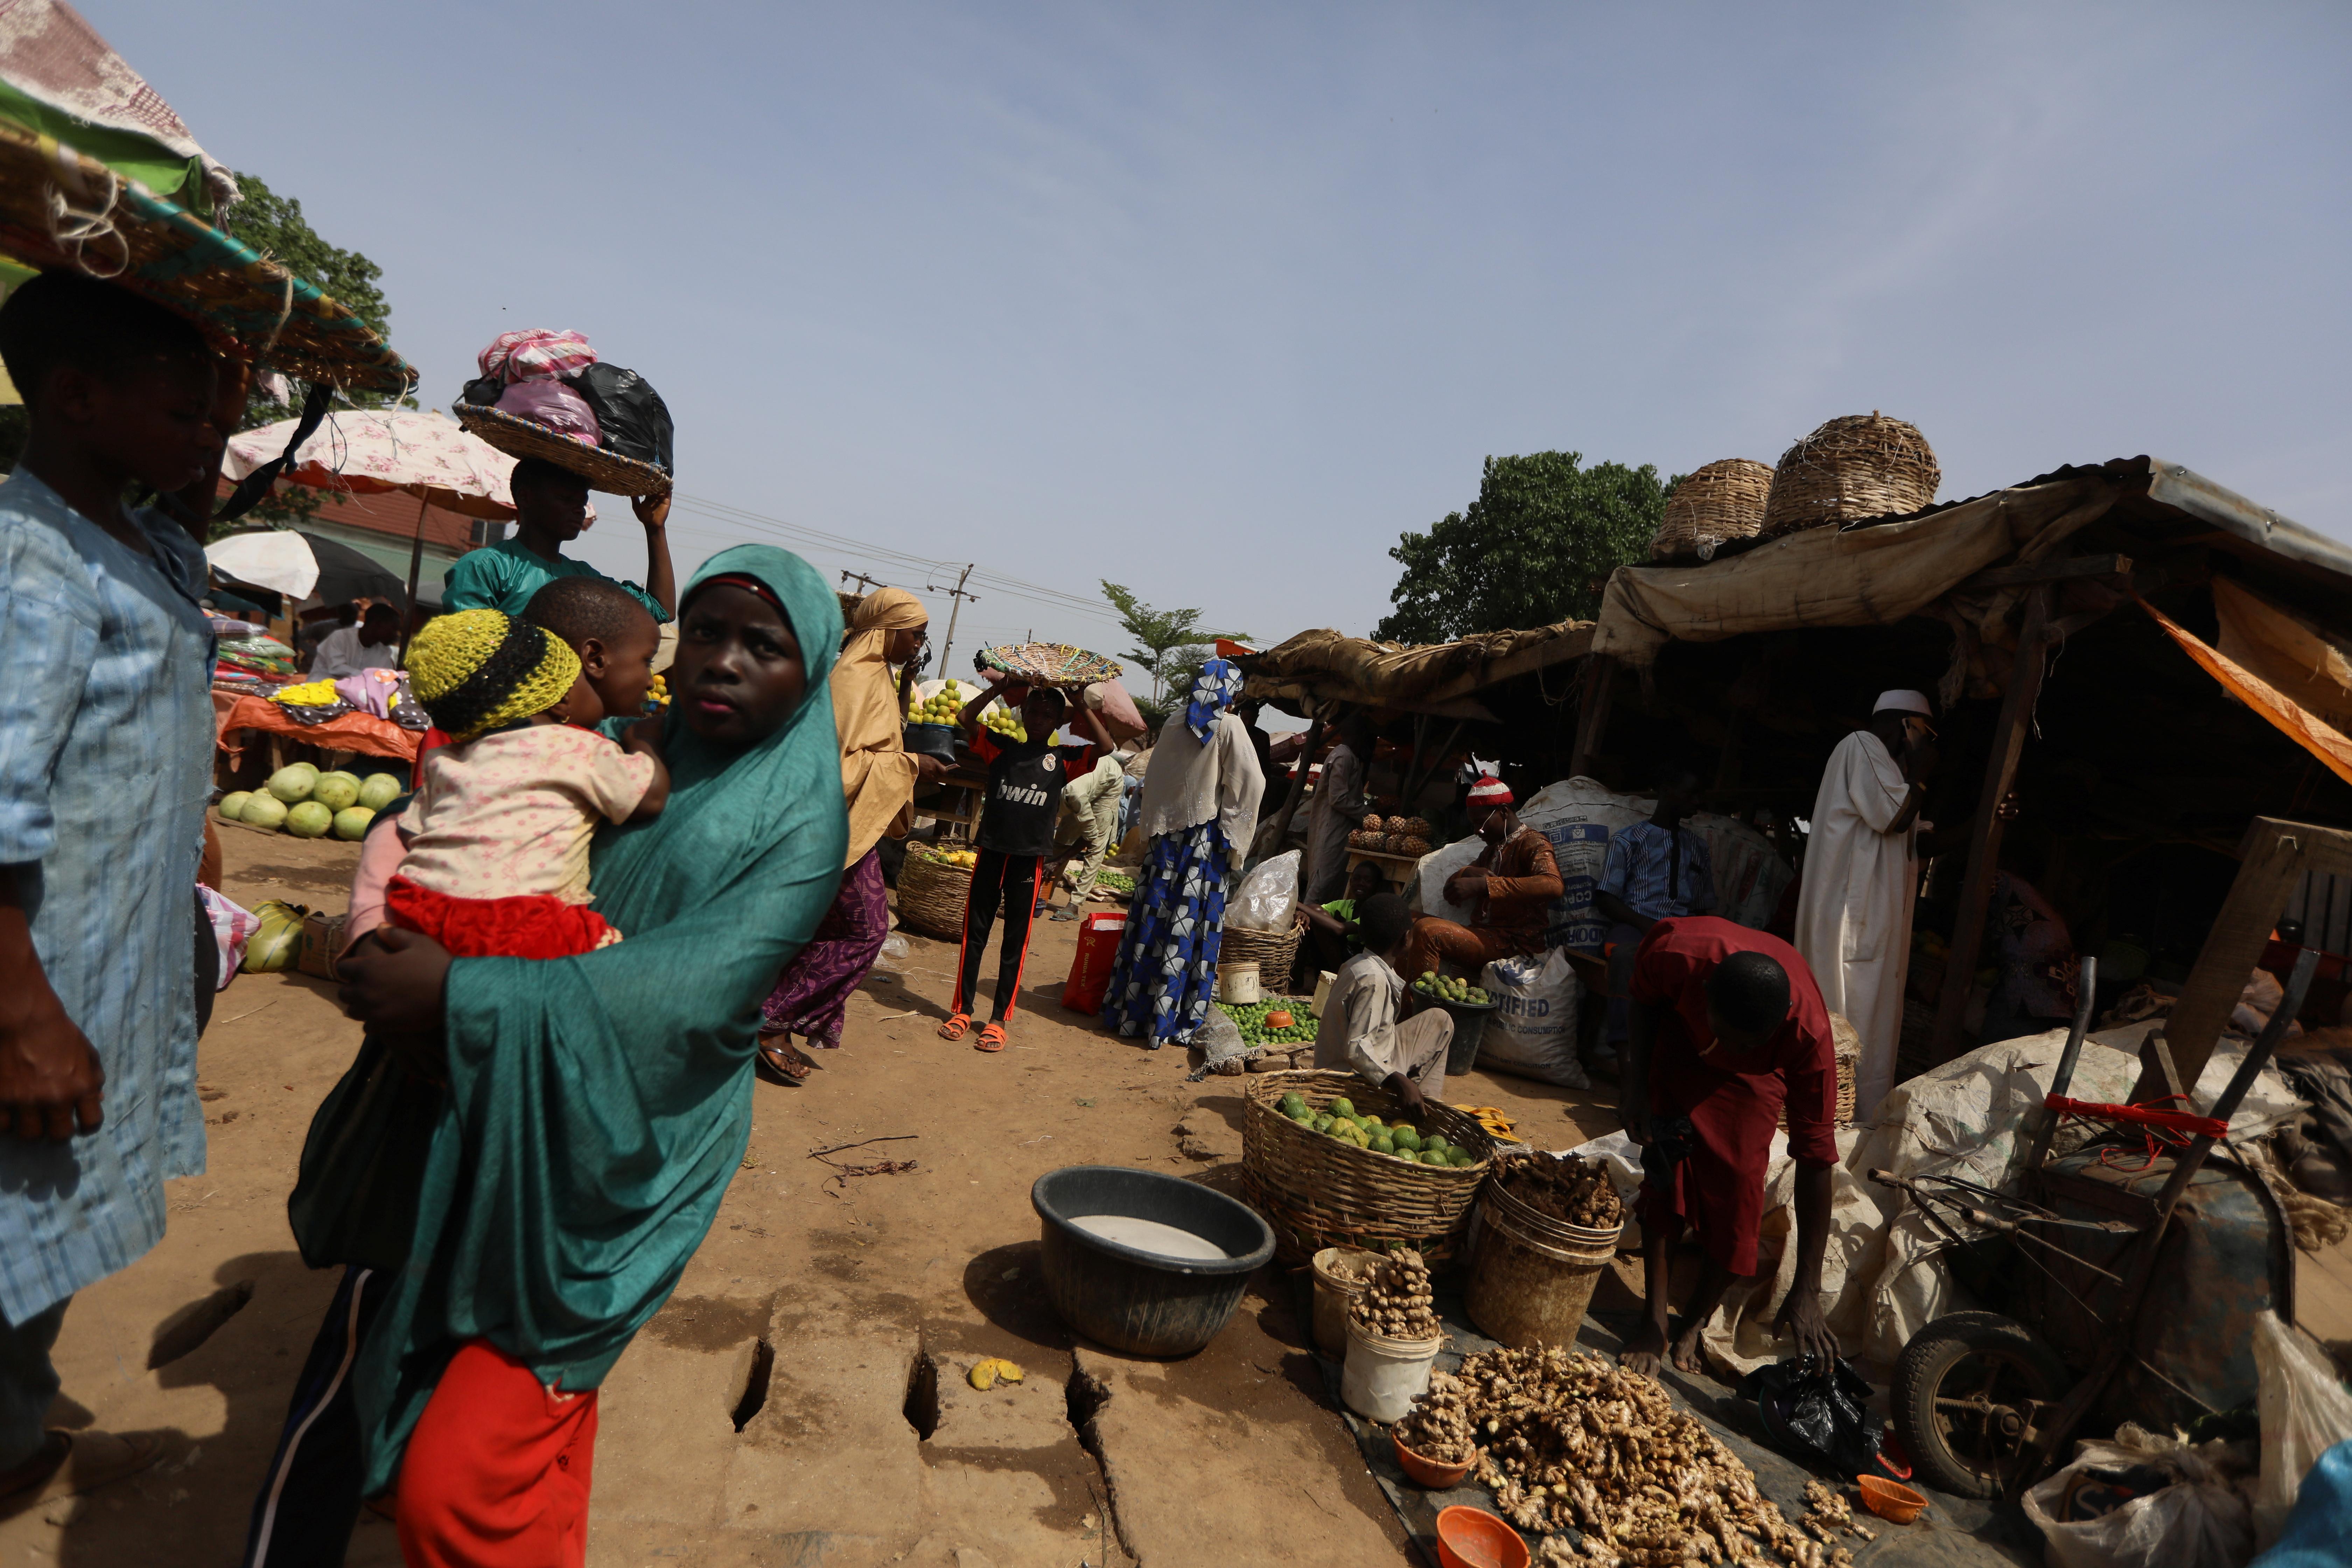 A man puts ginger plant bulbs in buckets at a market in Kaduna, Nigeria. April 30, 2021. REUTERS/Afolabi Sotunde